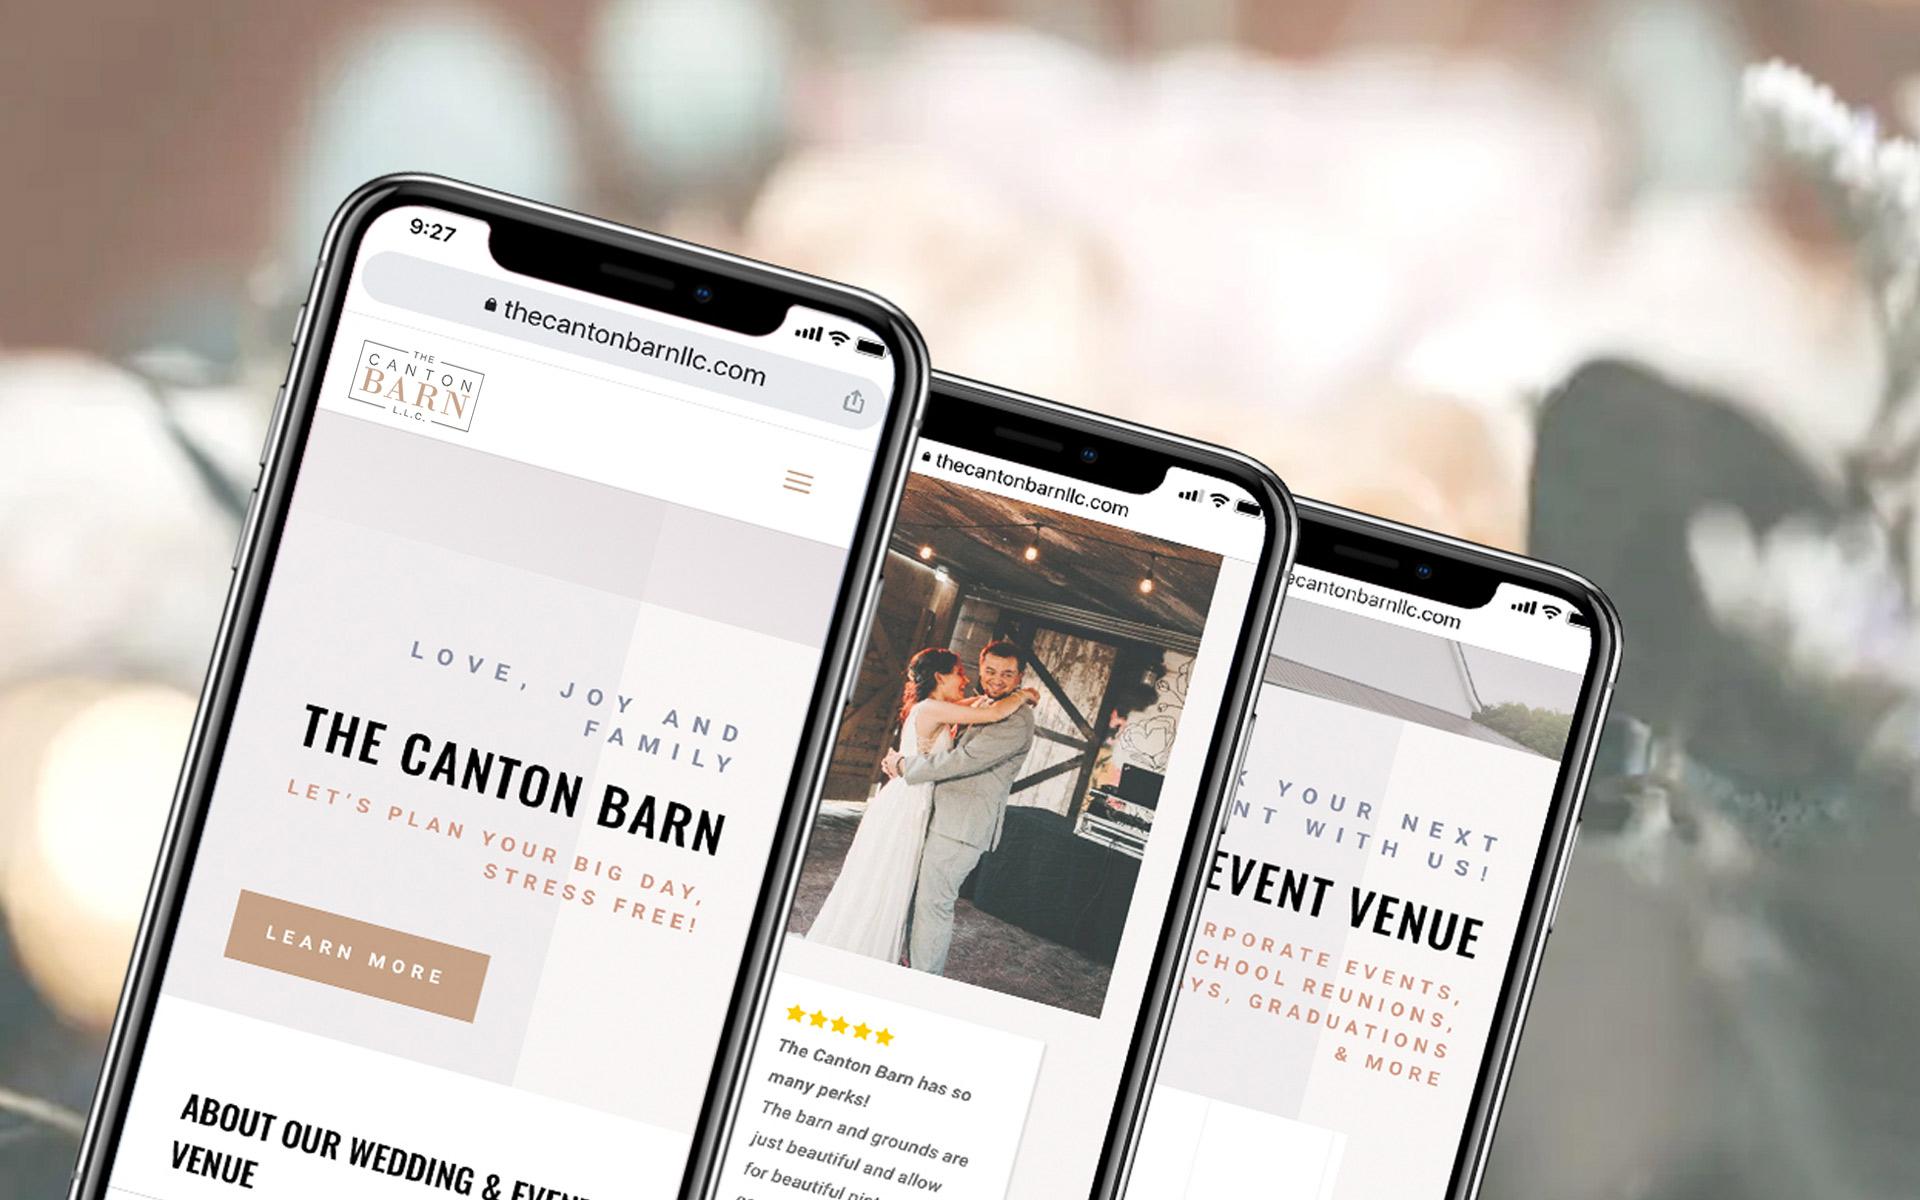 The Canton Barn website on phones